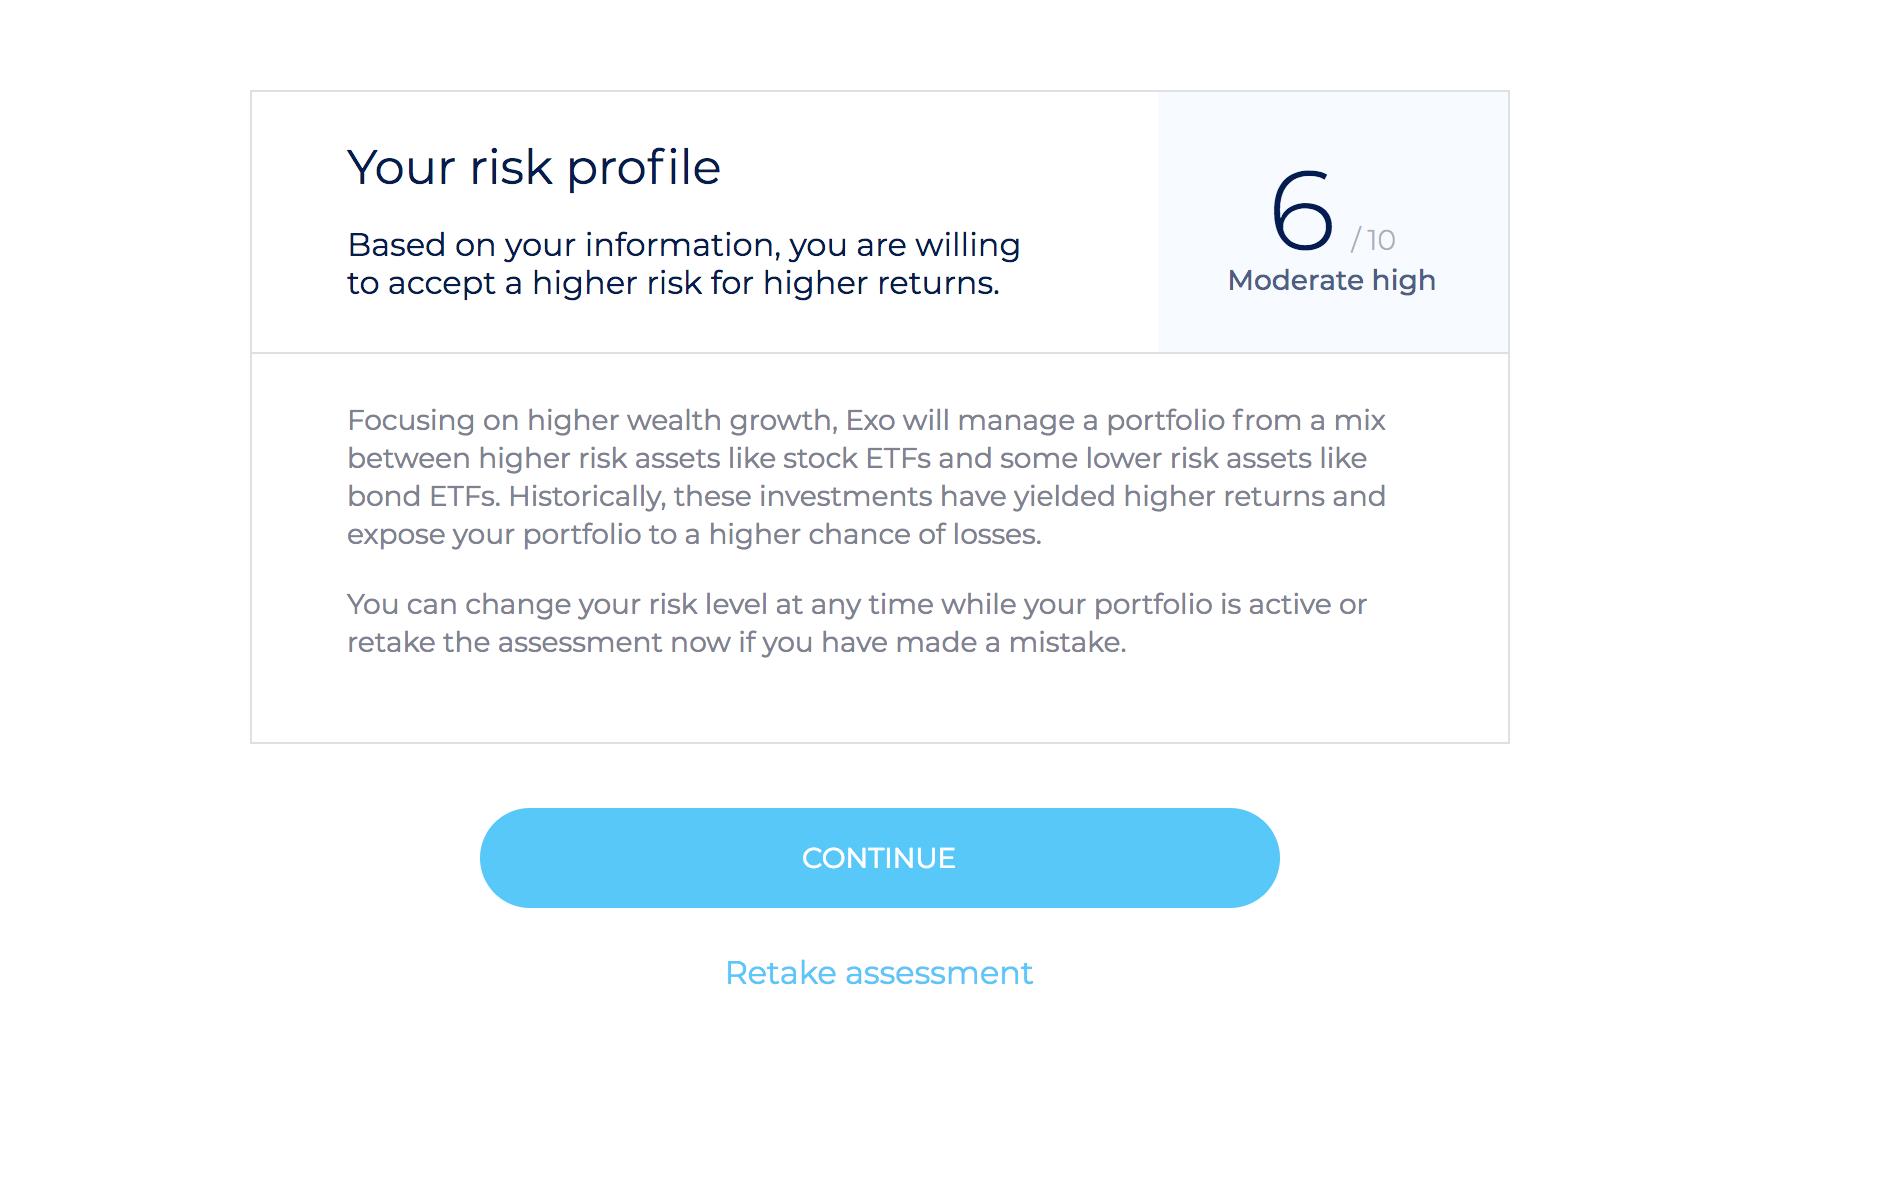 Exo investing risk profile